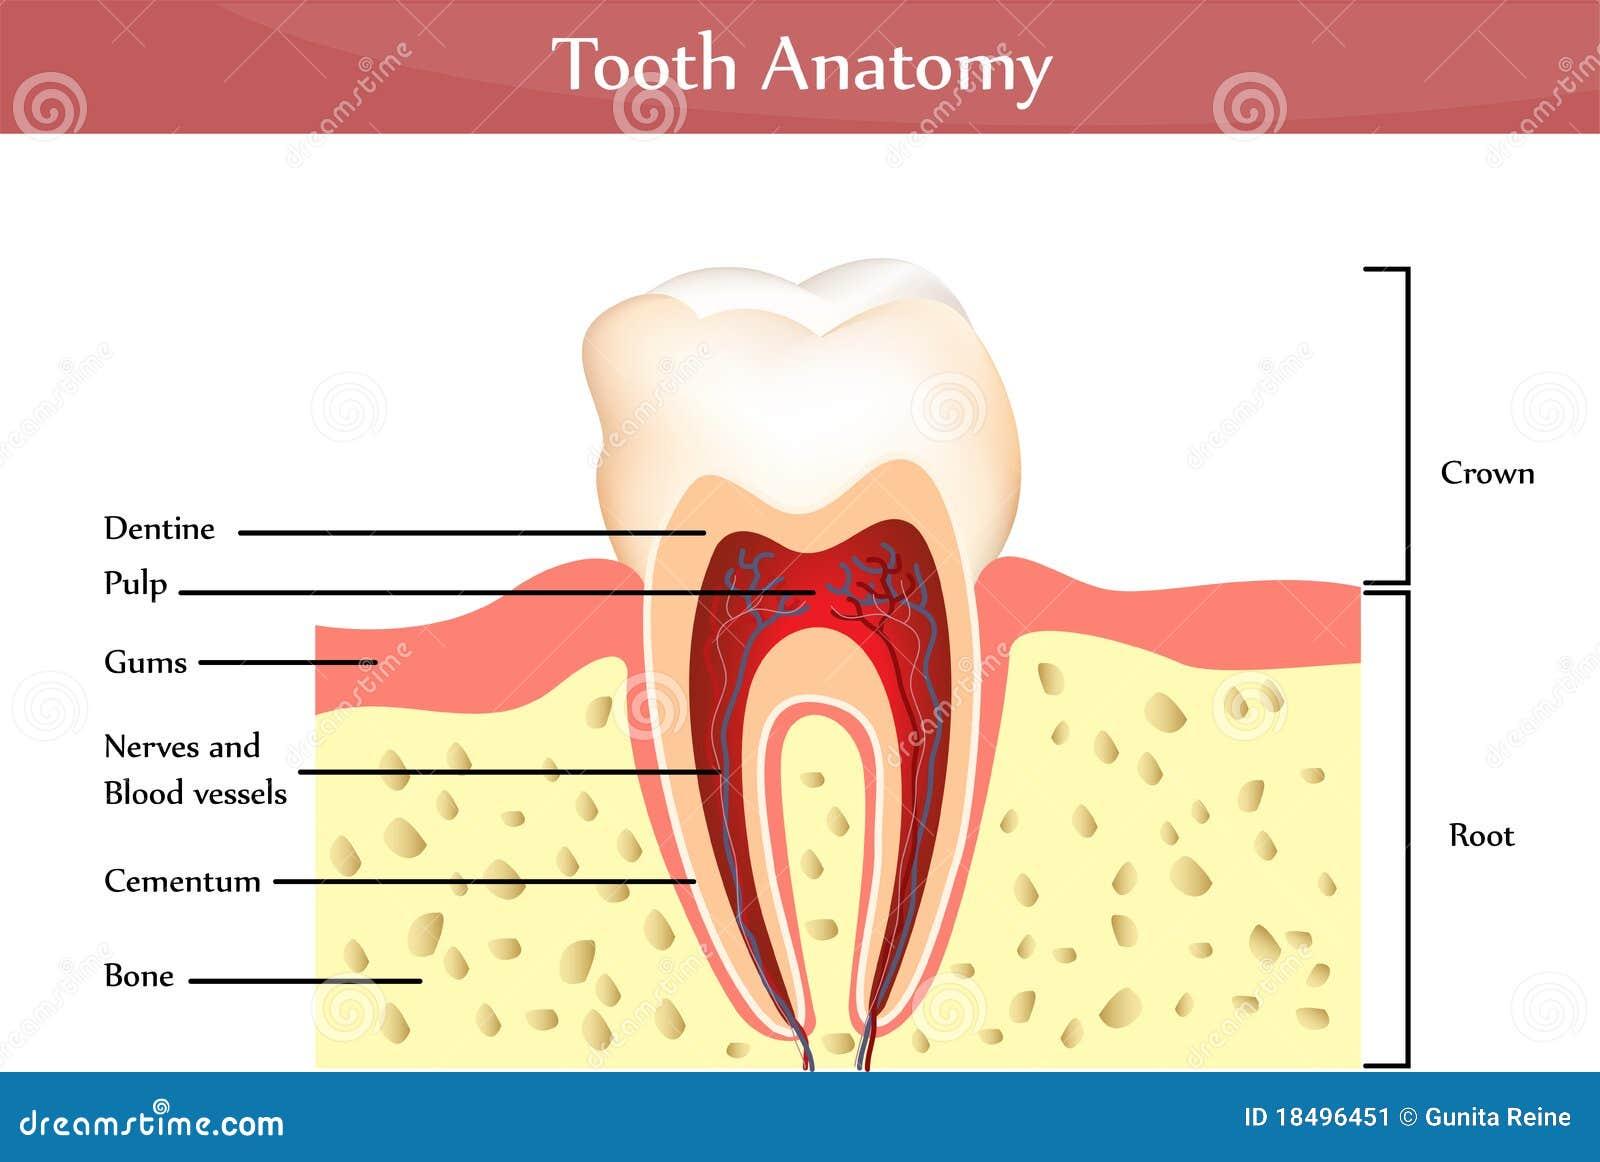 Tooth anatomy stock vector. Illustration of anatomy, hard - 18496451